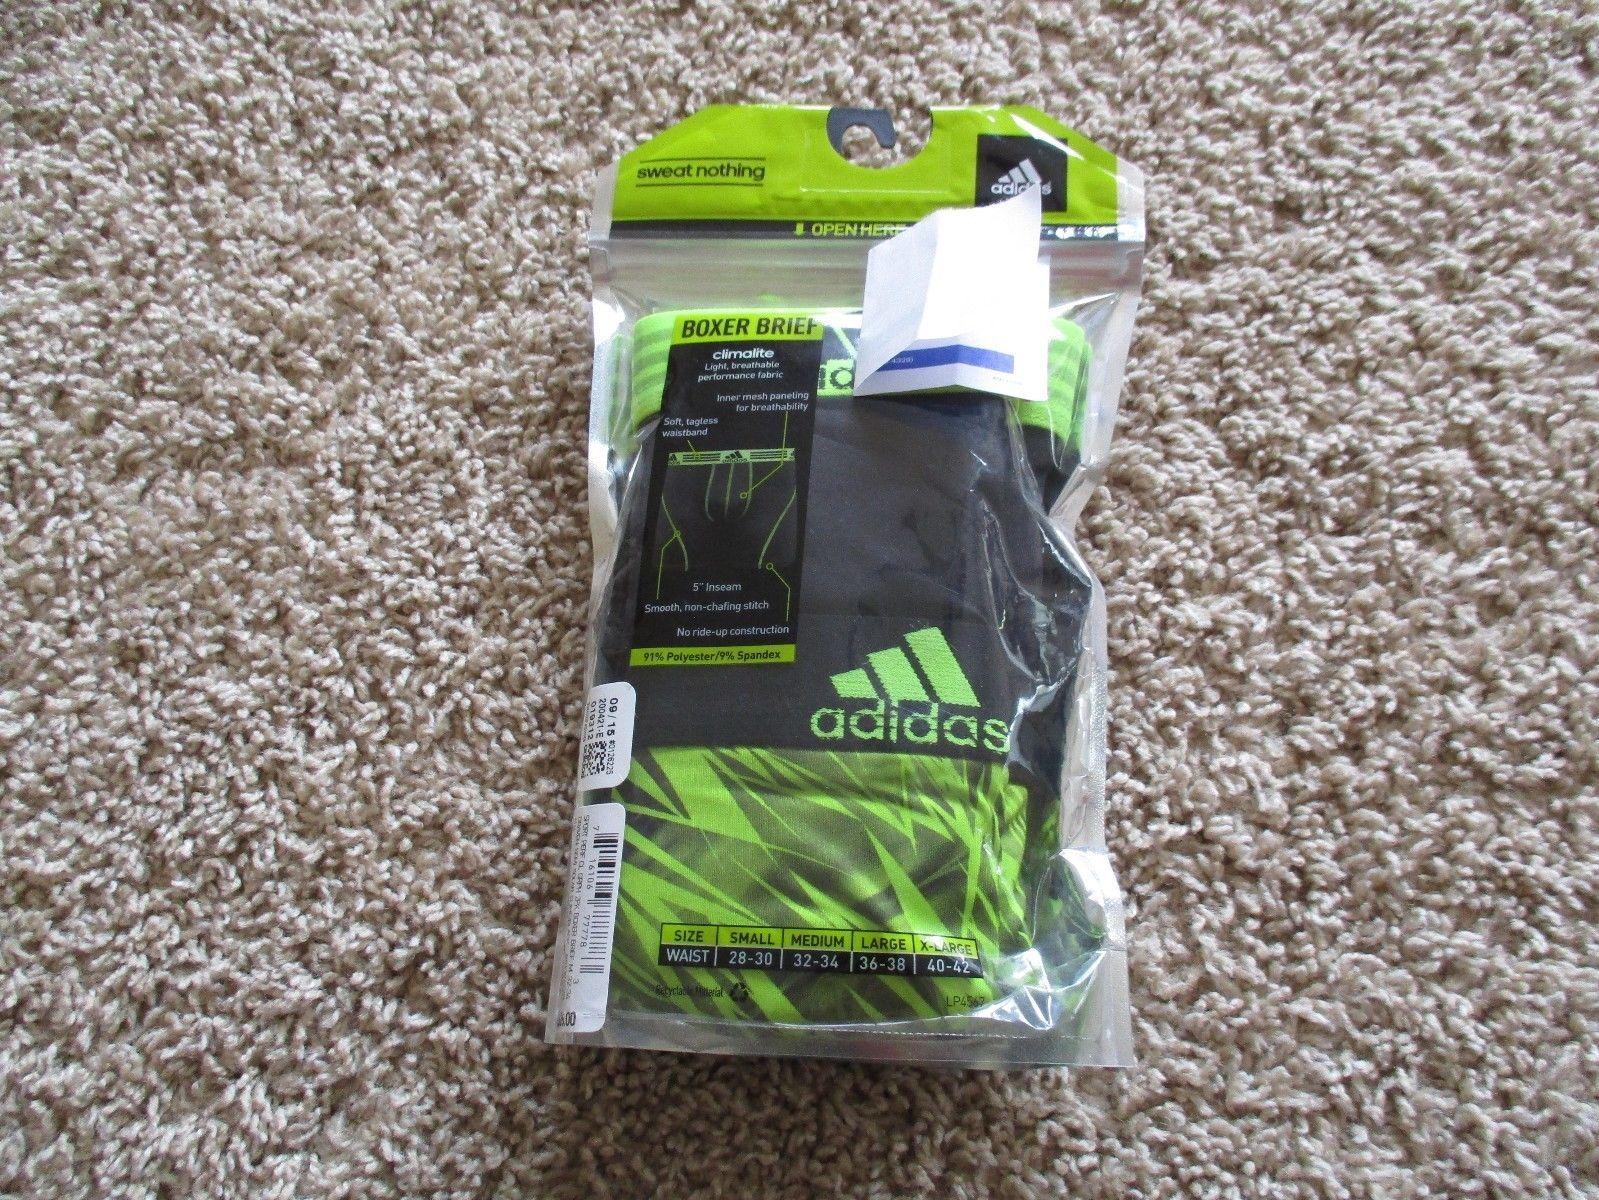 BNIP Adidas Climalite 2pk men's performance boxer briefs, Size M(32-34), $26